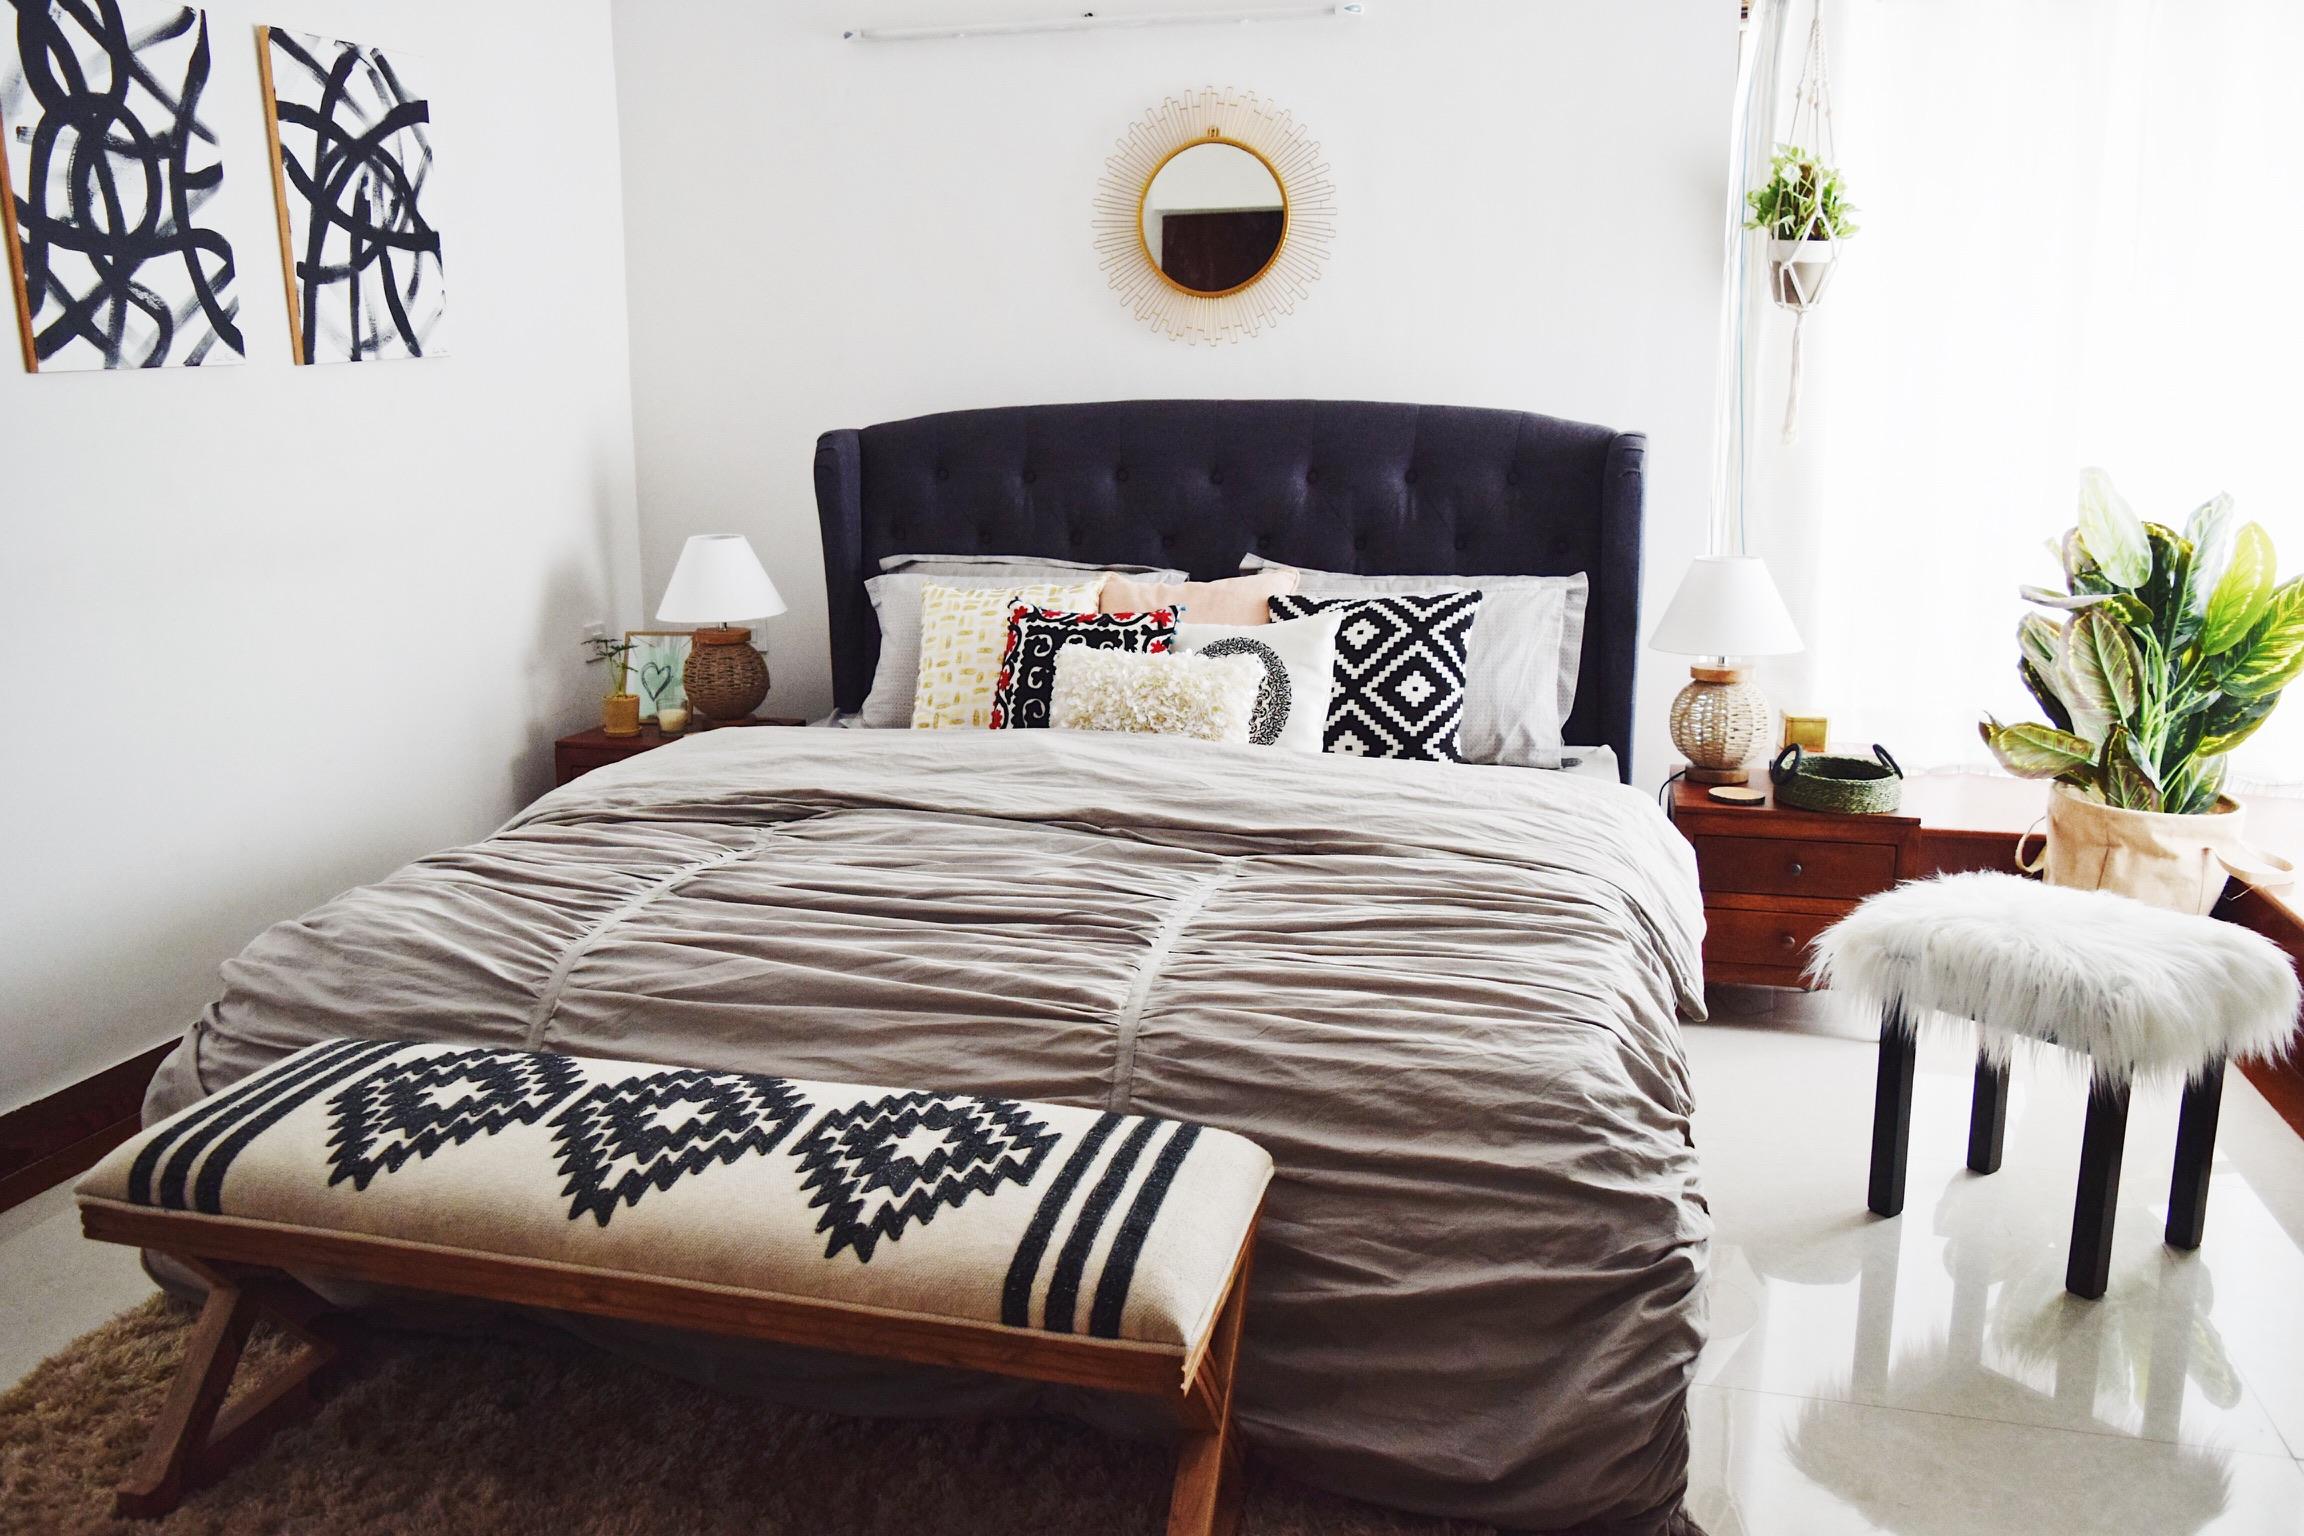 Living Room Decor Ideas The Urban Guide